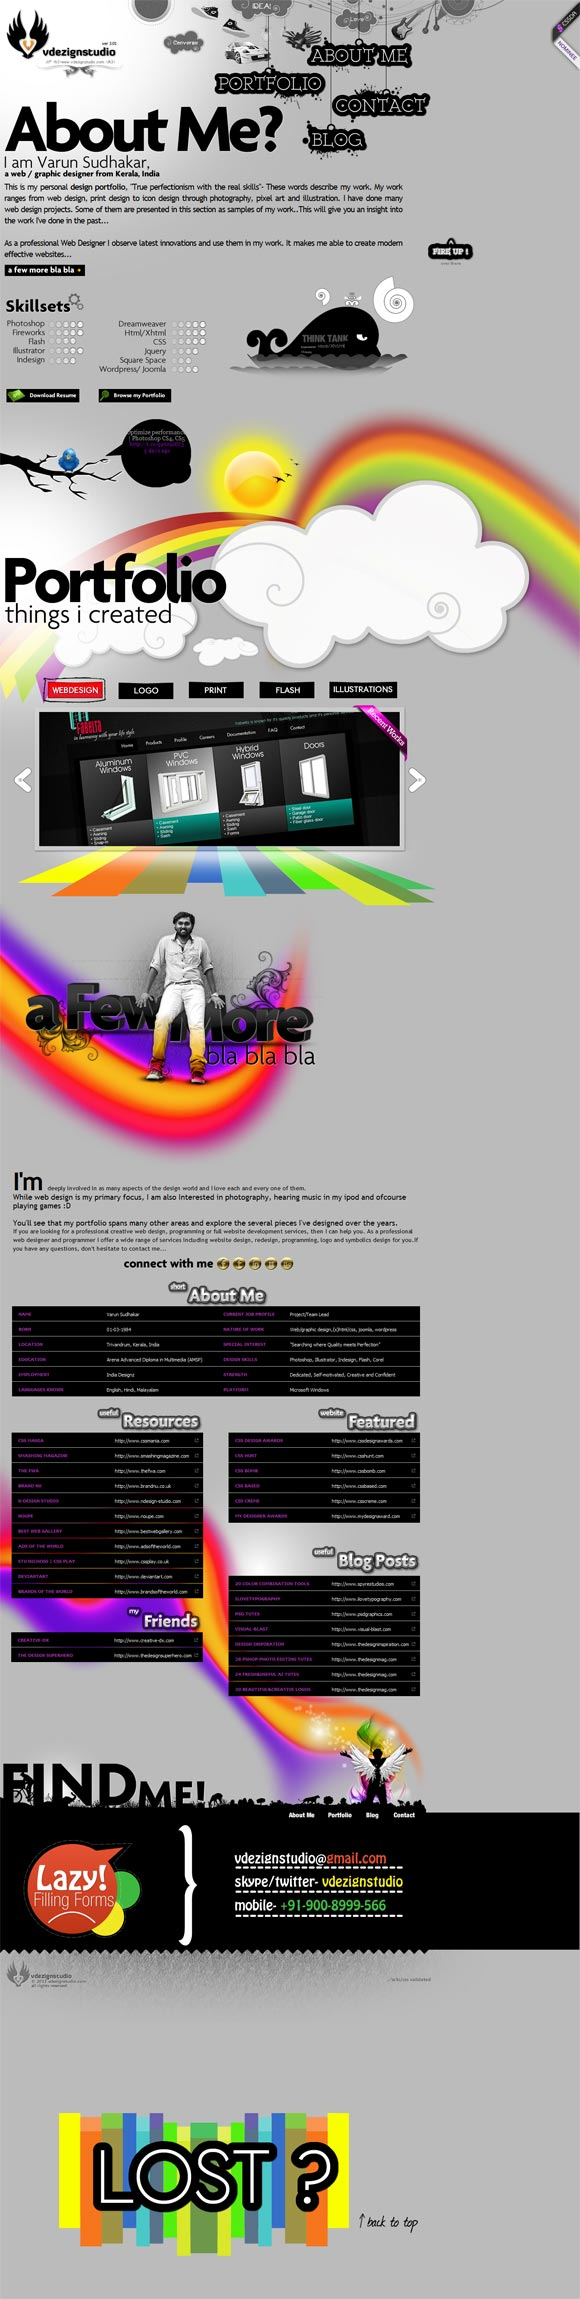 Varun Sudhakar | Web Designer